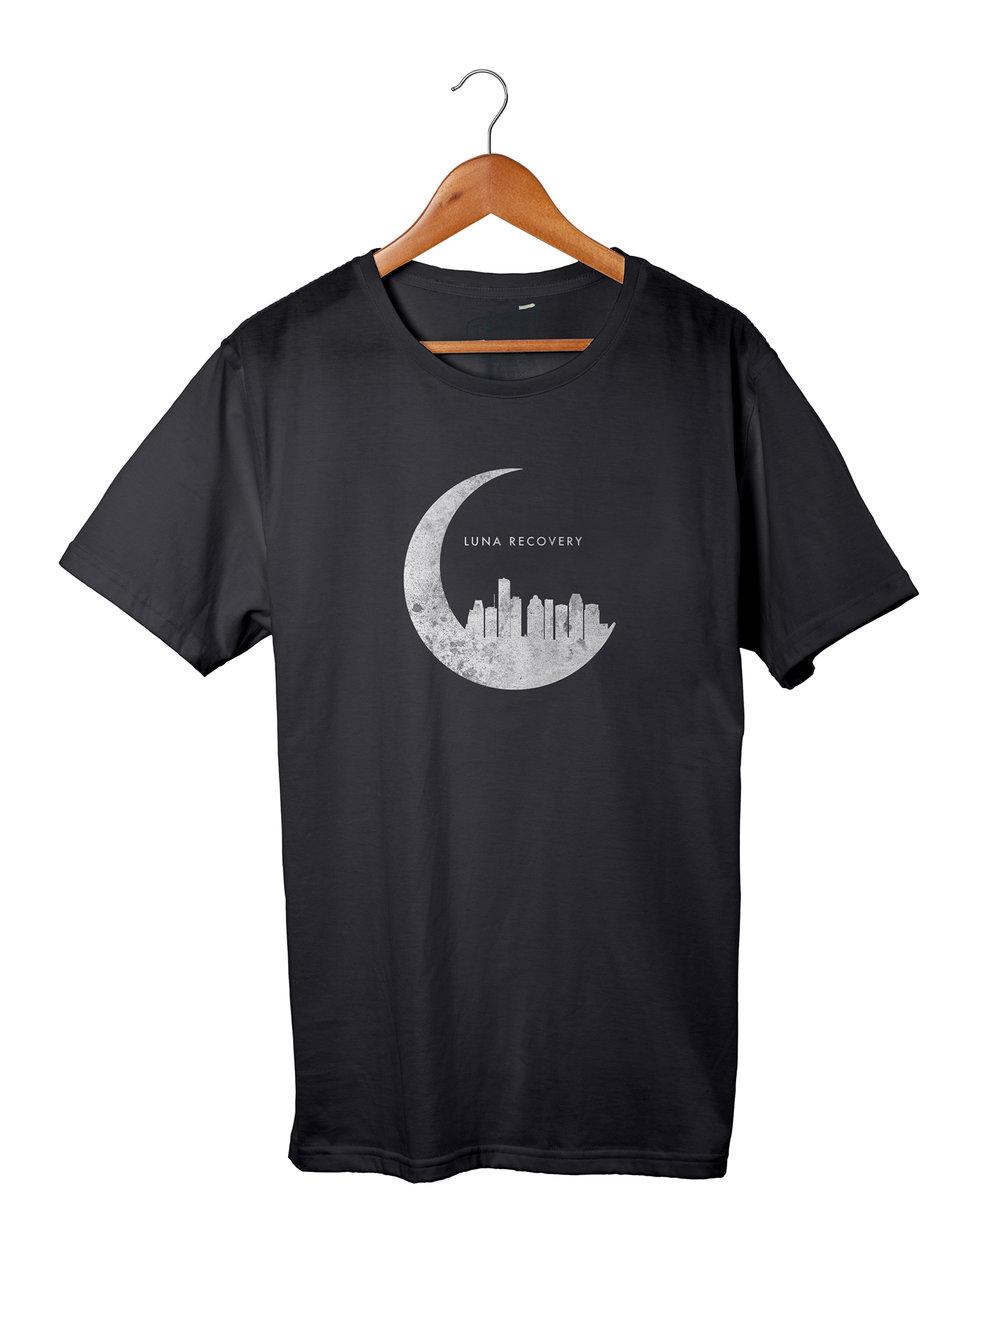 Luna_T-Shirt-Hanging-Mockup3.jpg